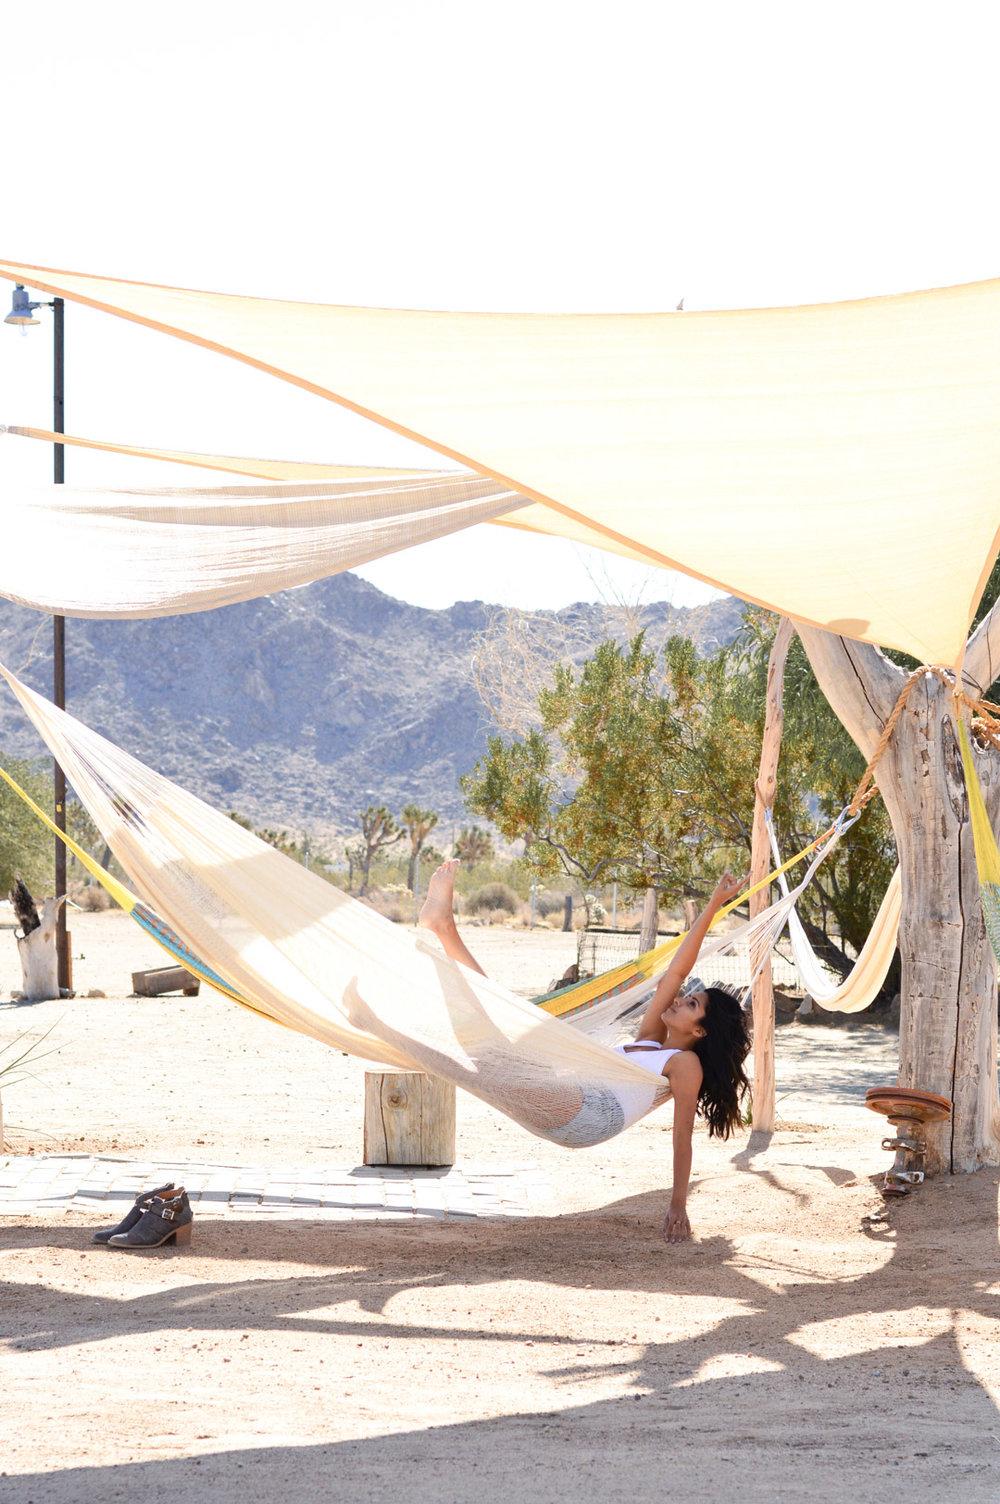 joshua-tree-hammocks-desert-california-travel-airbnb-where-to-stay 6